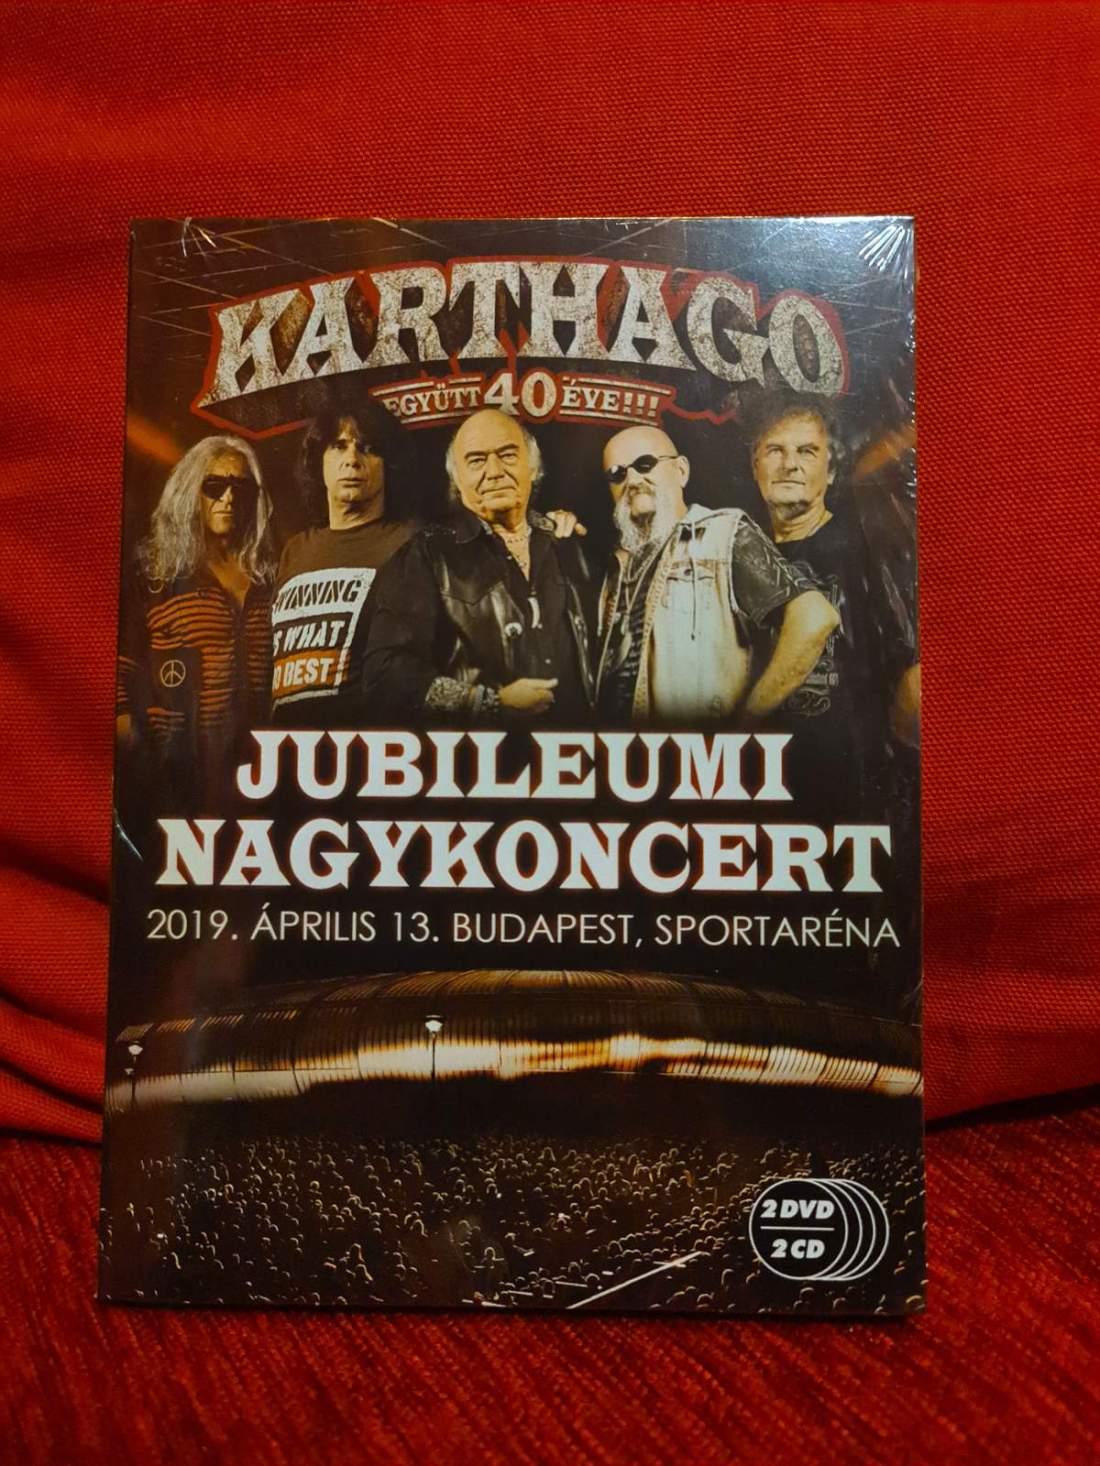 KARTHAGO - EGYÜTT 40 ÉVE - JUBILEUMI NAGYKONCERT 2DVD+2CD